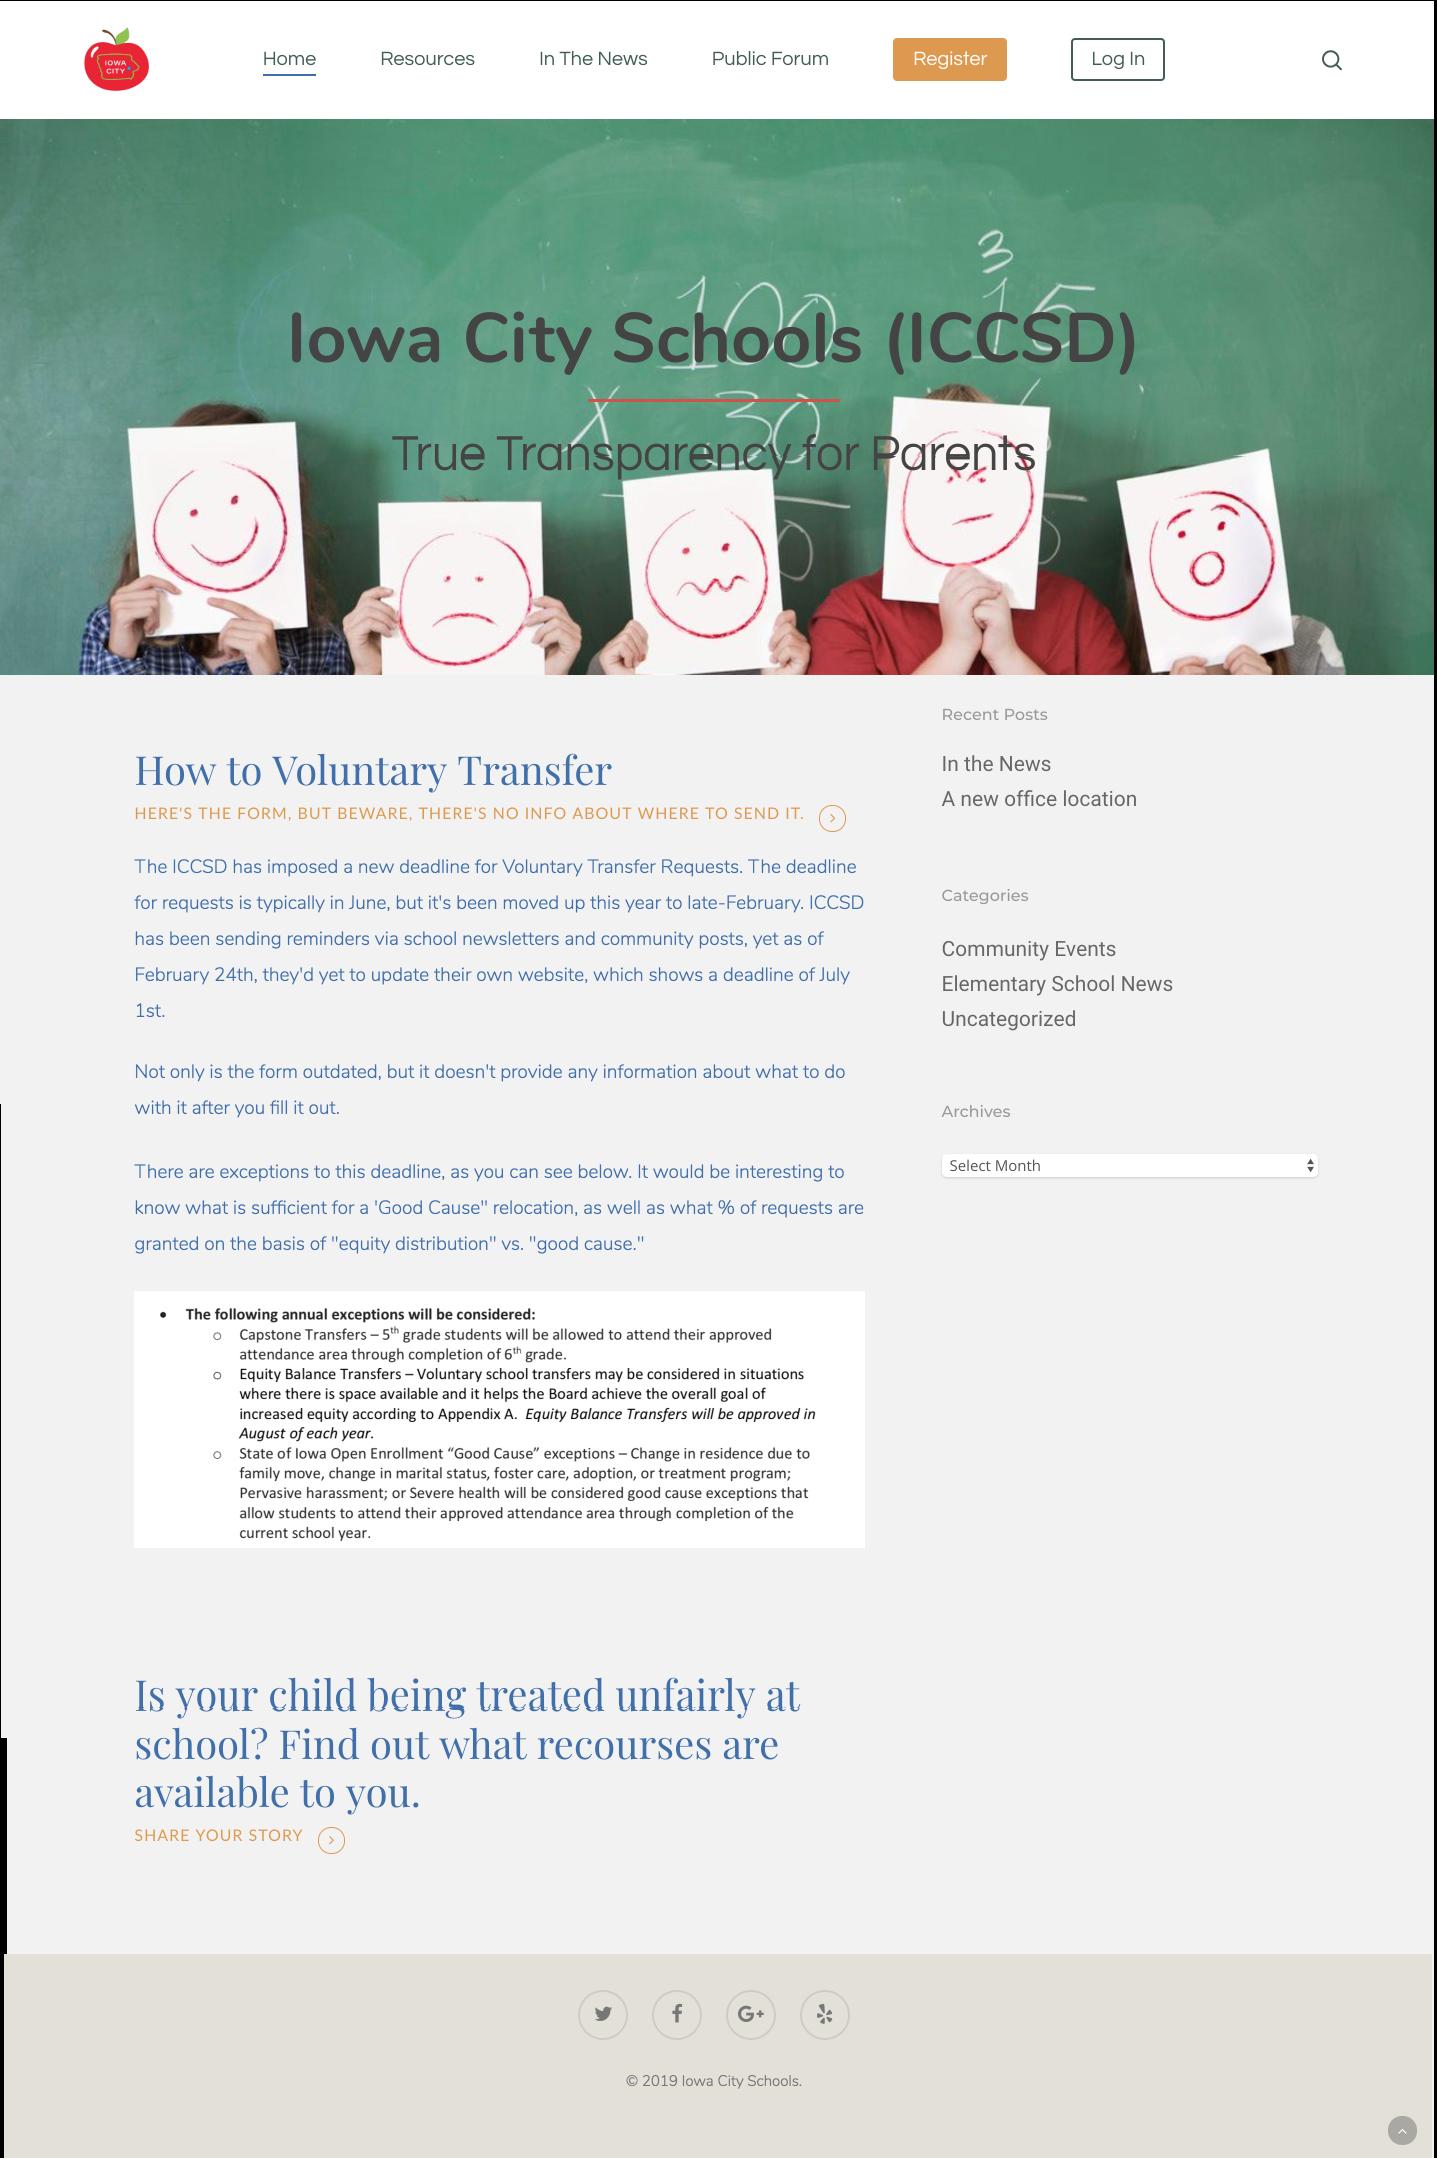 Iowa City School District – True Transparency for Parents